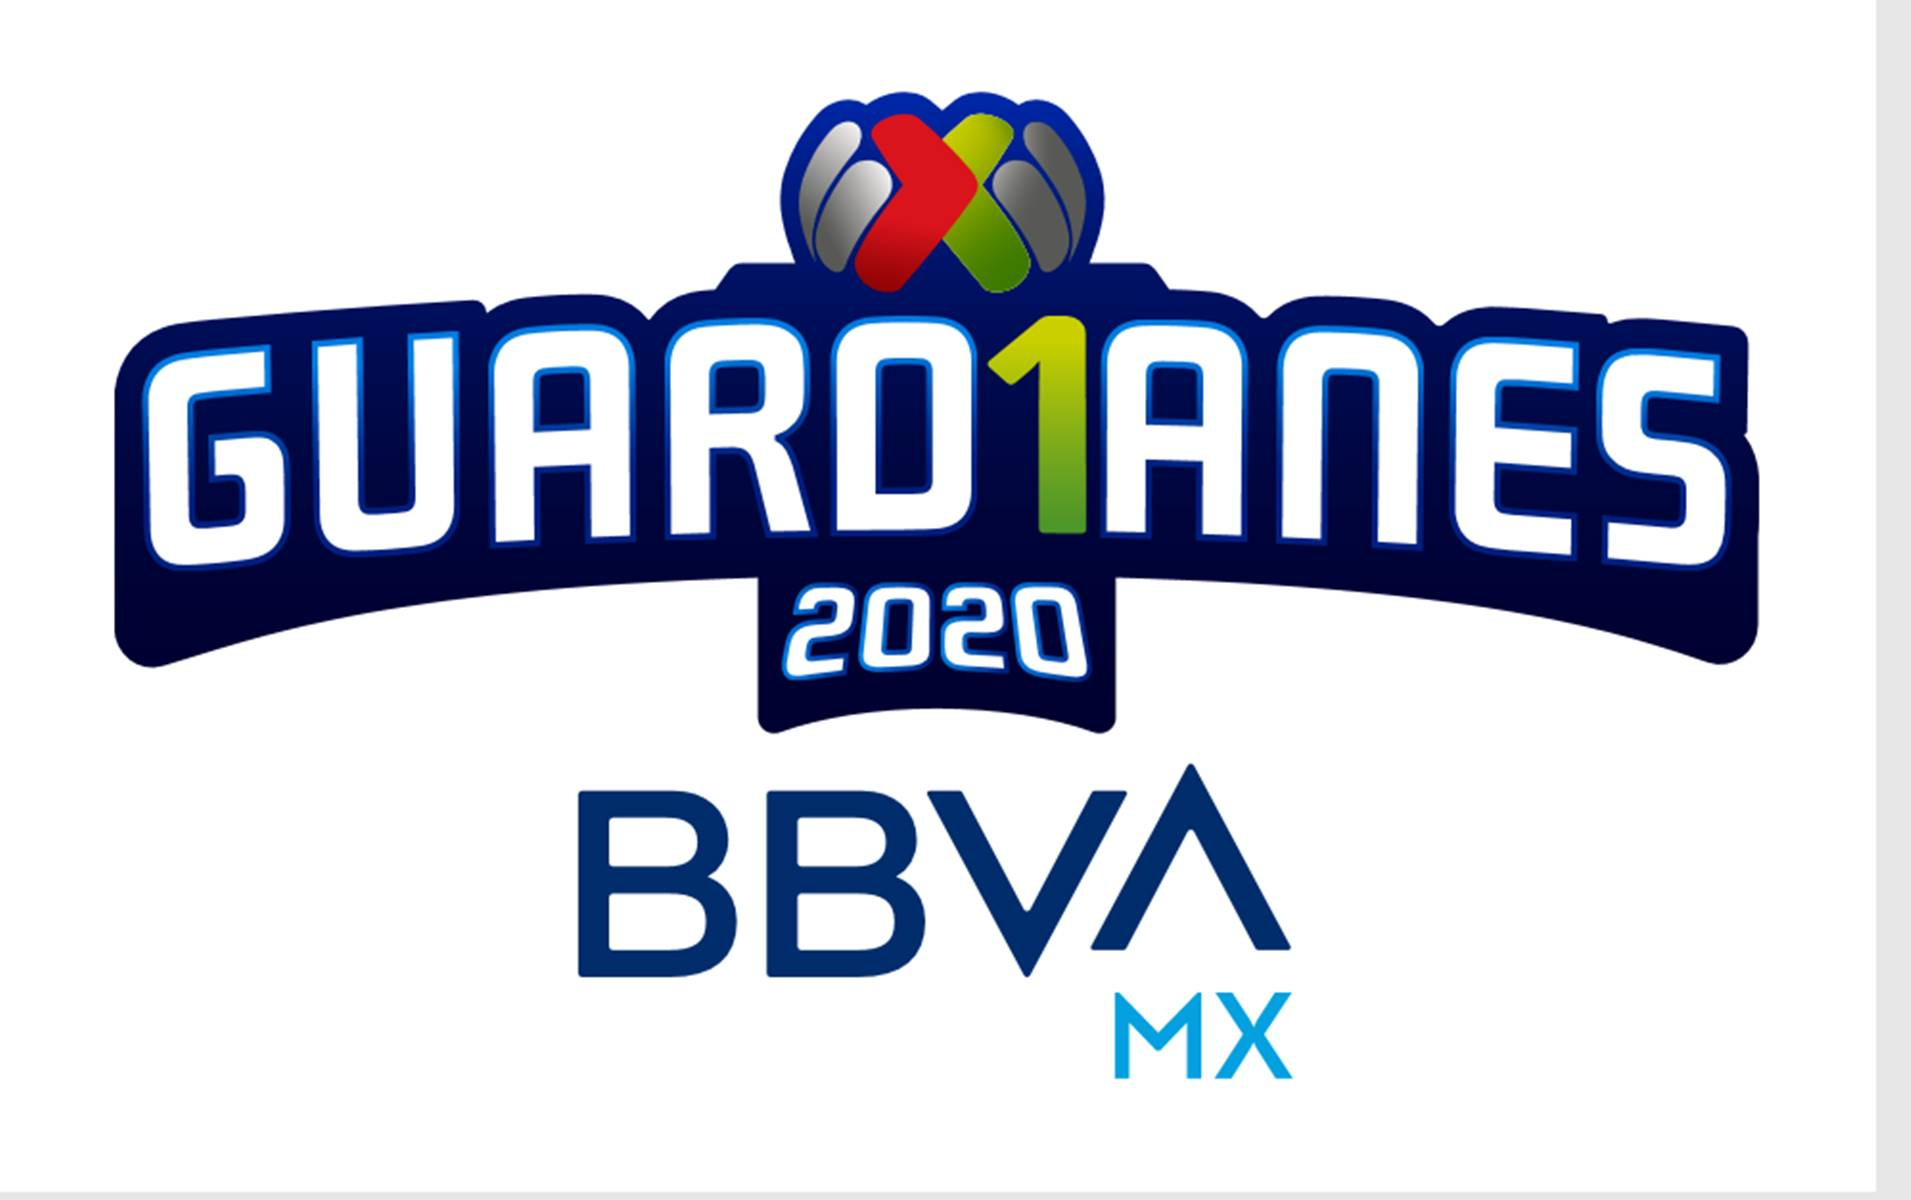 GUARD1ANES el nuevo torneo del futbol mexicano. Foto: Liga MX